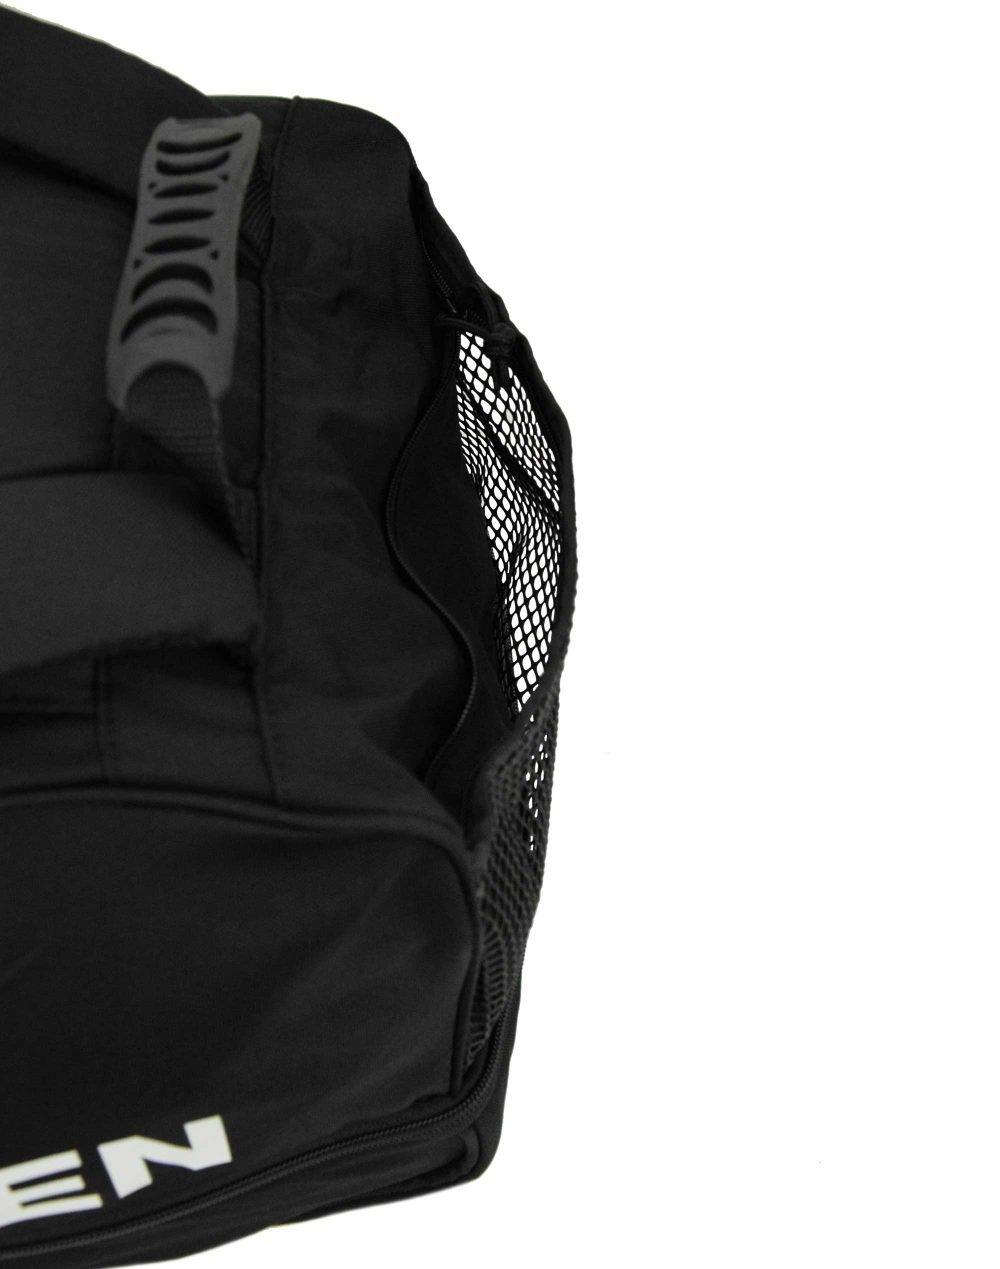 Helly Hansen Racing Bag (67381-990) Black